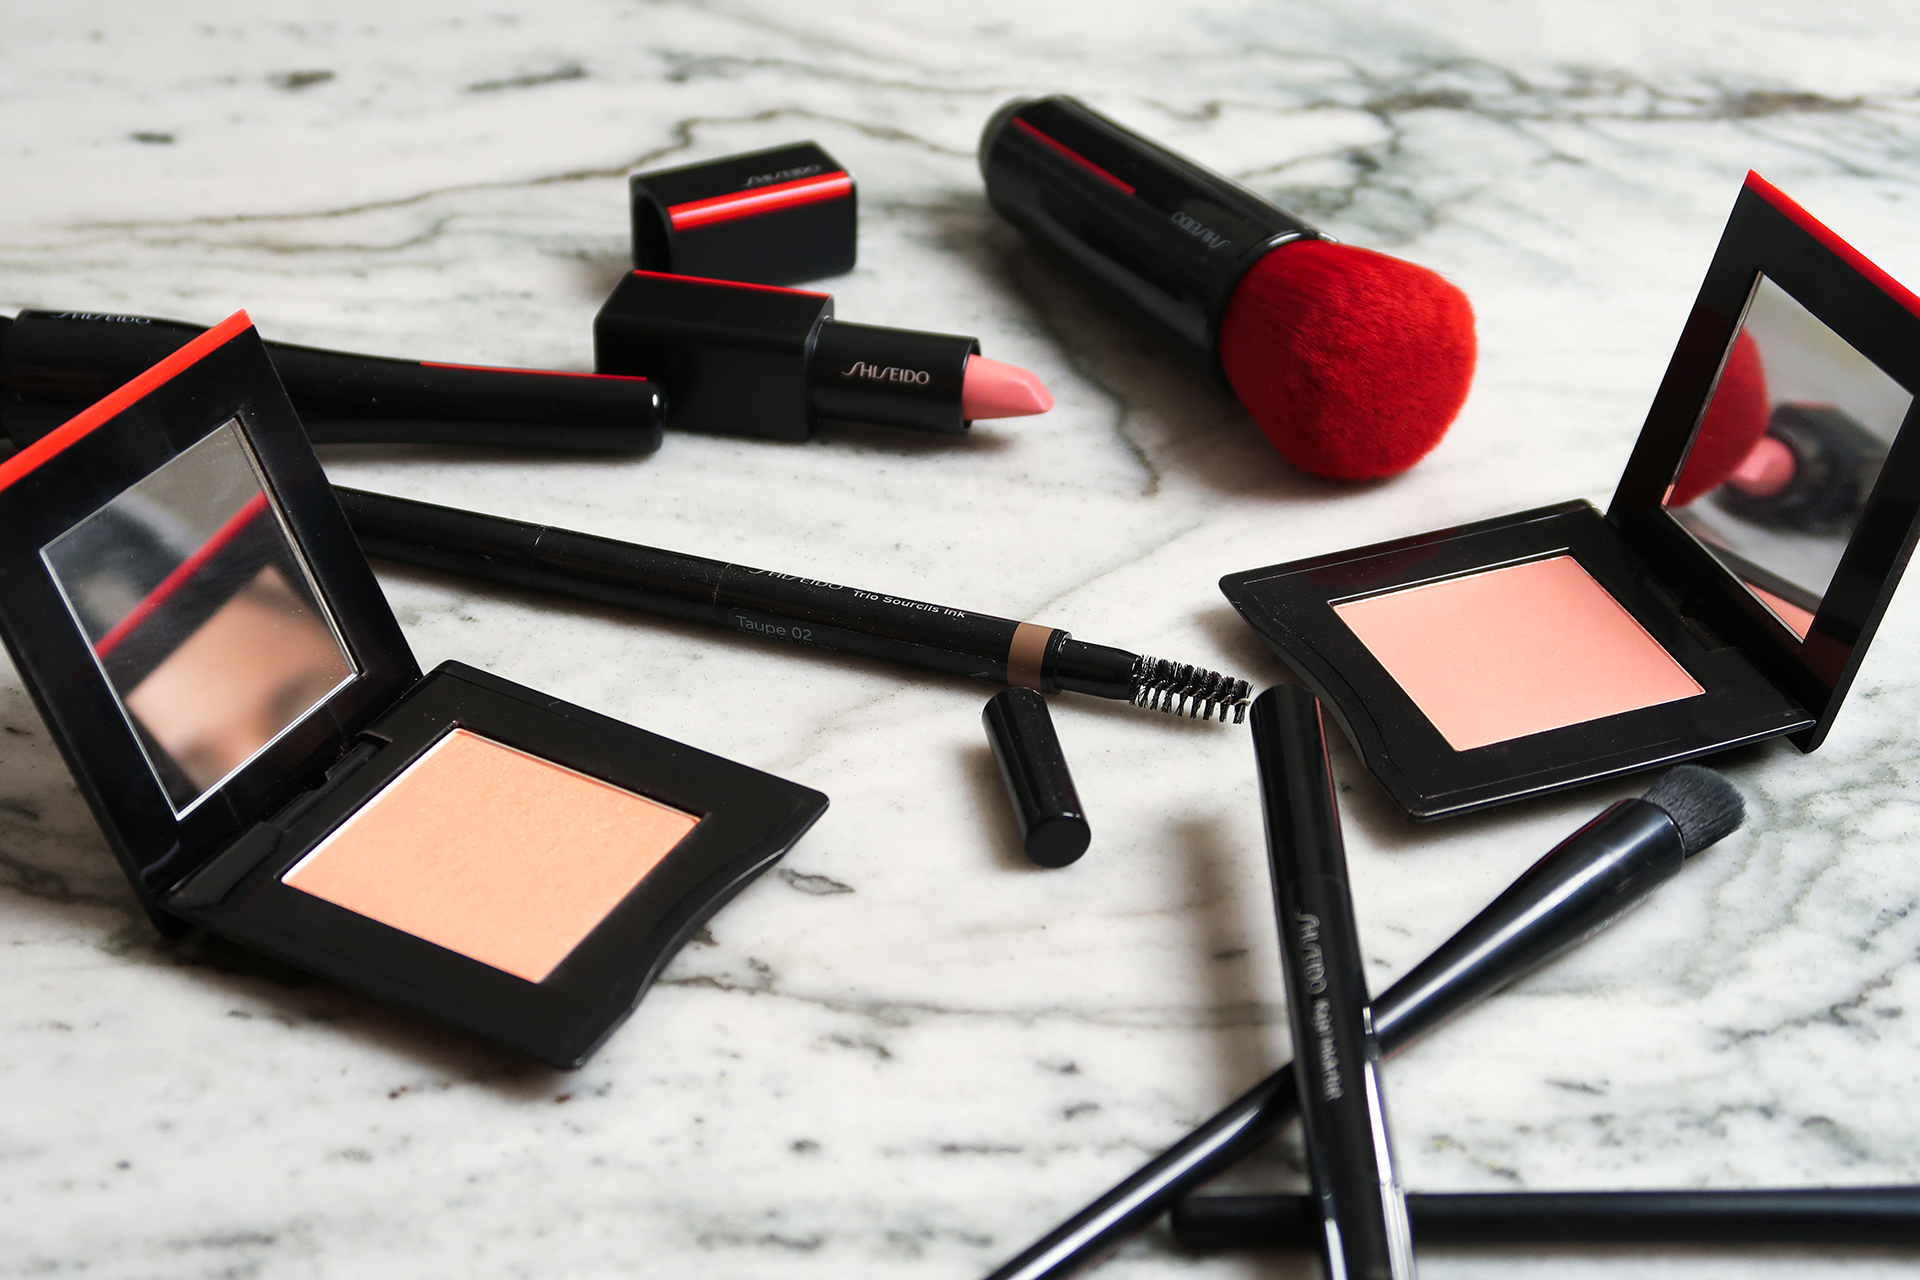 Shiseido Eyeshadows Fall Makeup